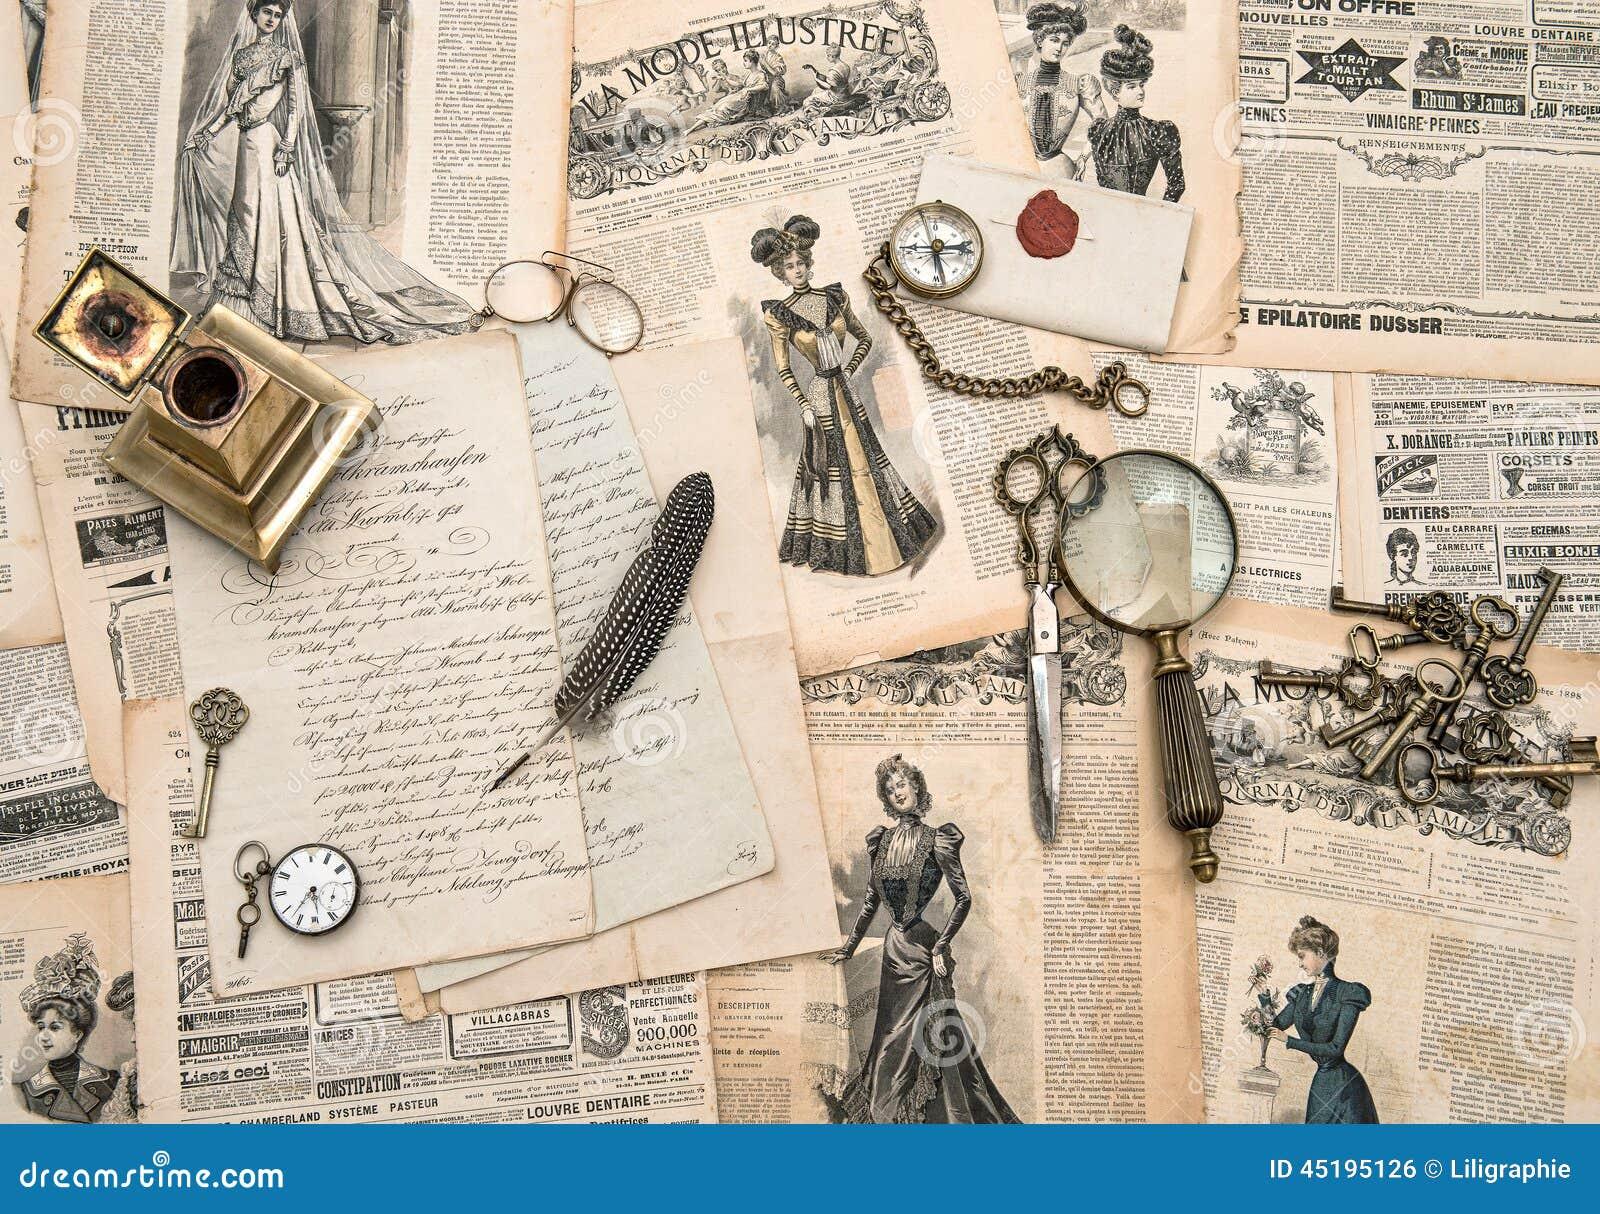 1898 Antique Magazine Article, Stuttgart, Germany. 34 illustrations